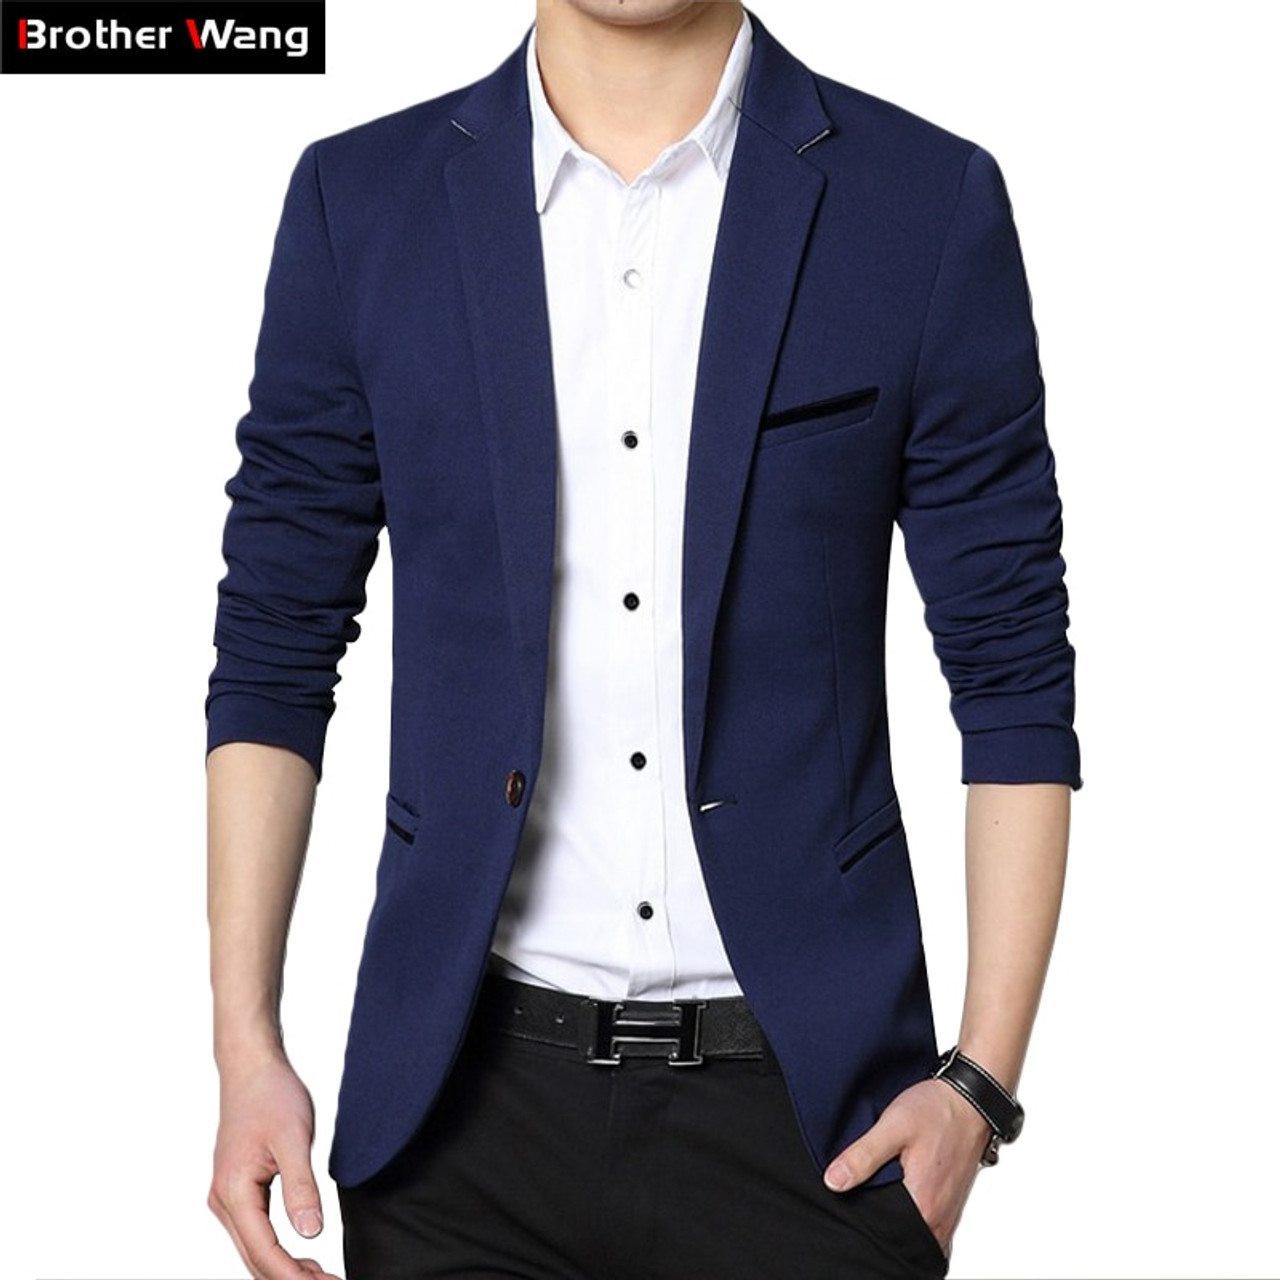 2019 Autumn New Men\u0027s Blazer Coat Business Casual Fashion Blue Slim Fit  Suit Male Brand Clothing